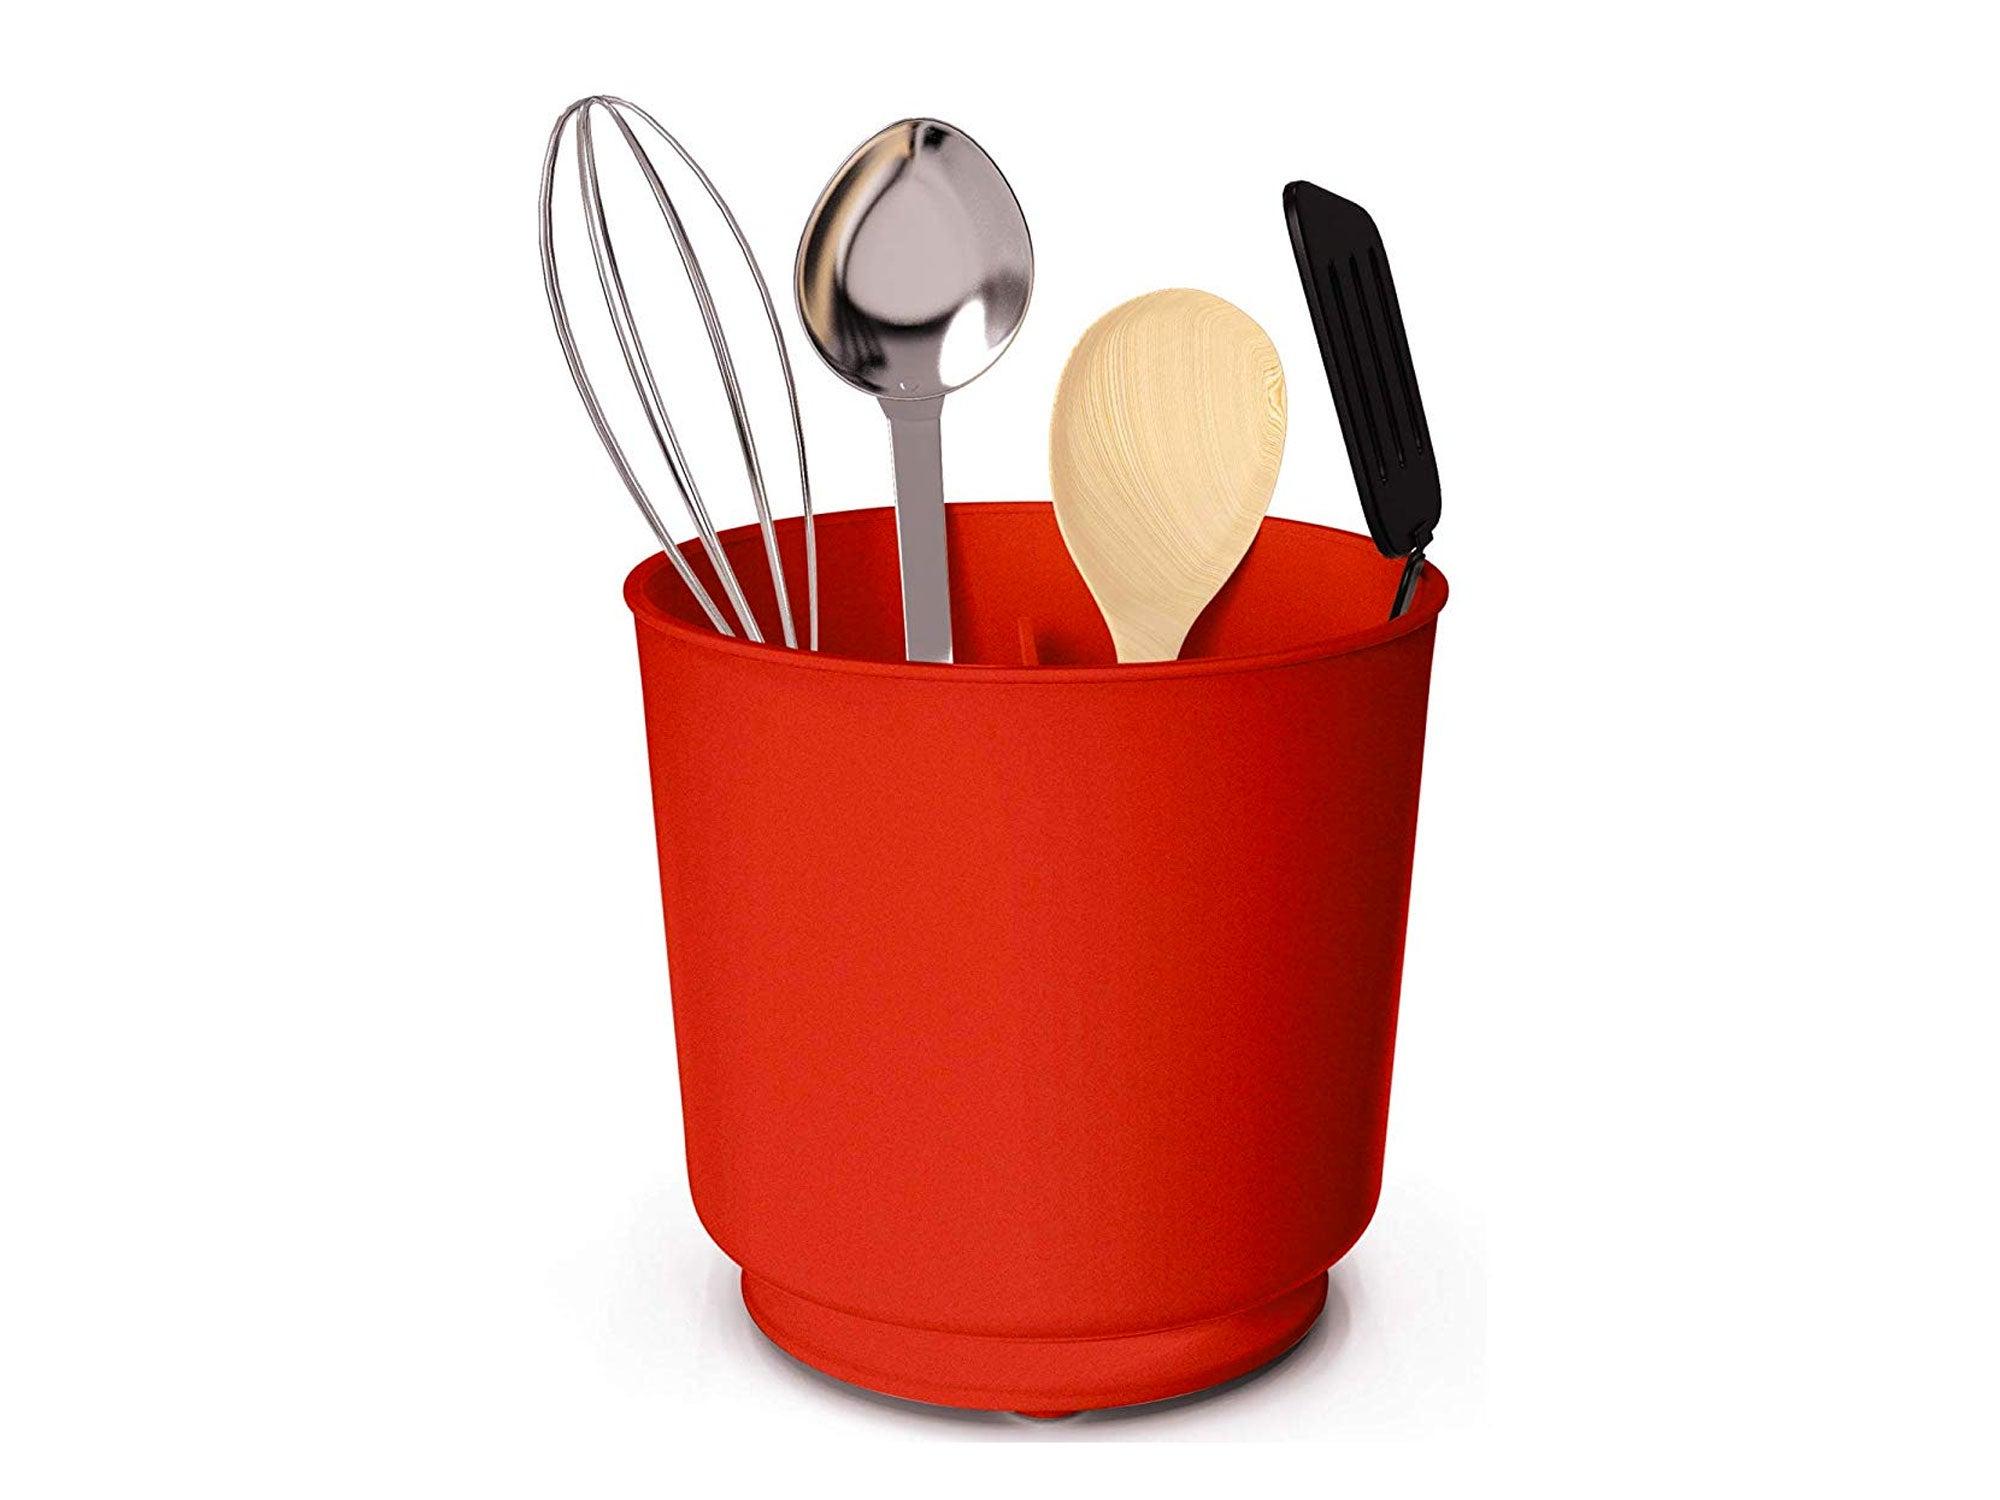 Large red utensil crock